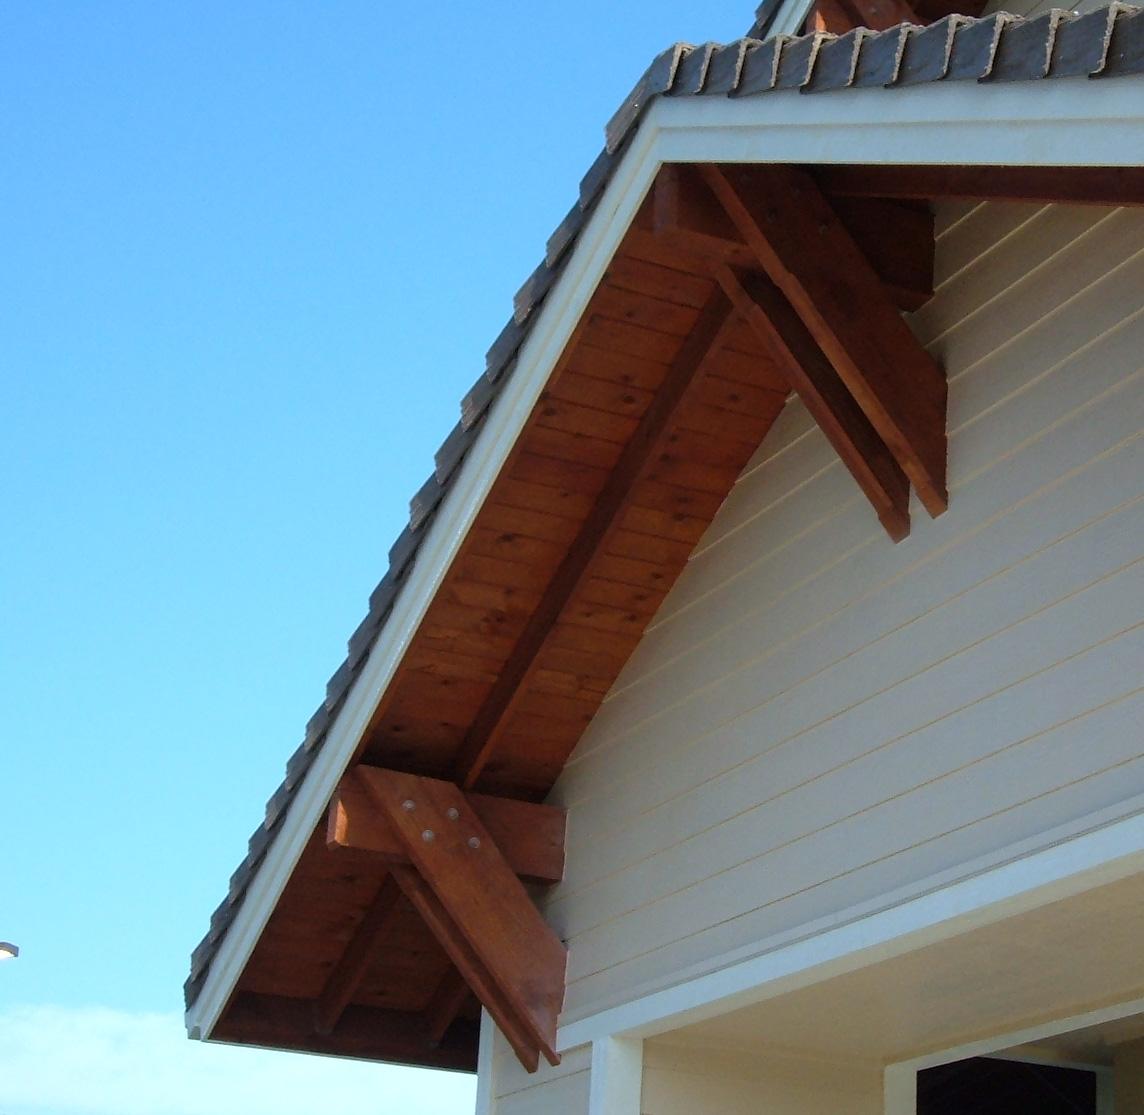 Jerold l dougal architect soffit design for Osb t g